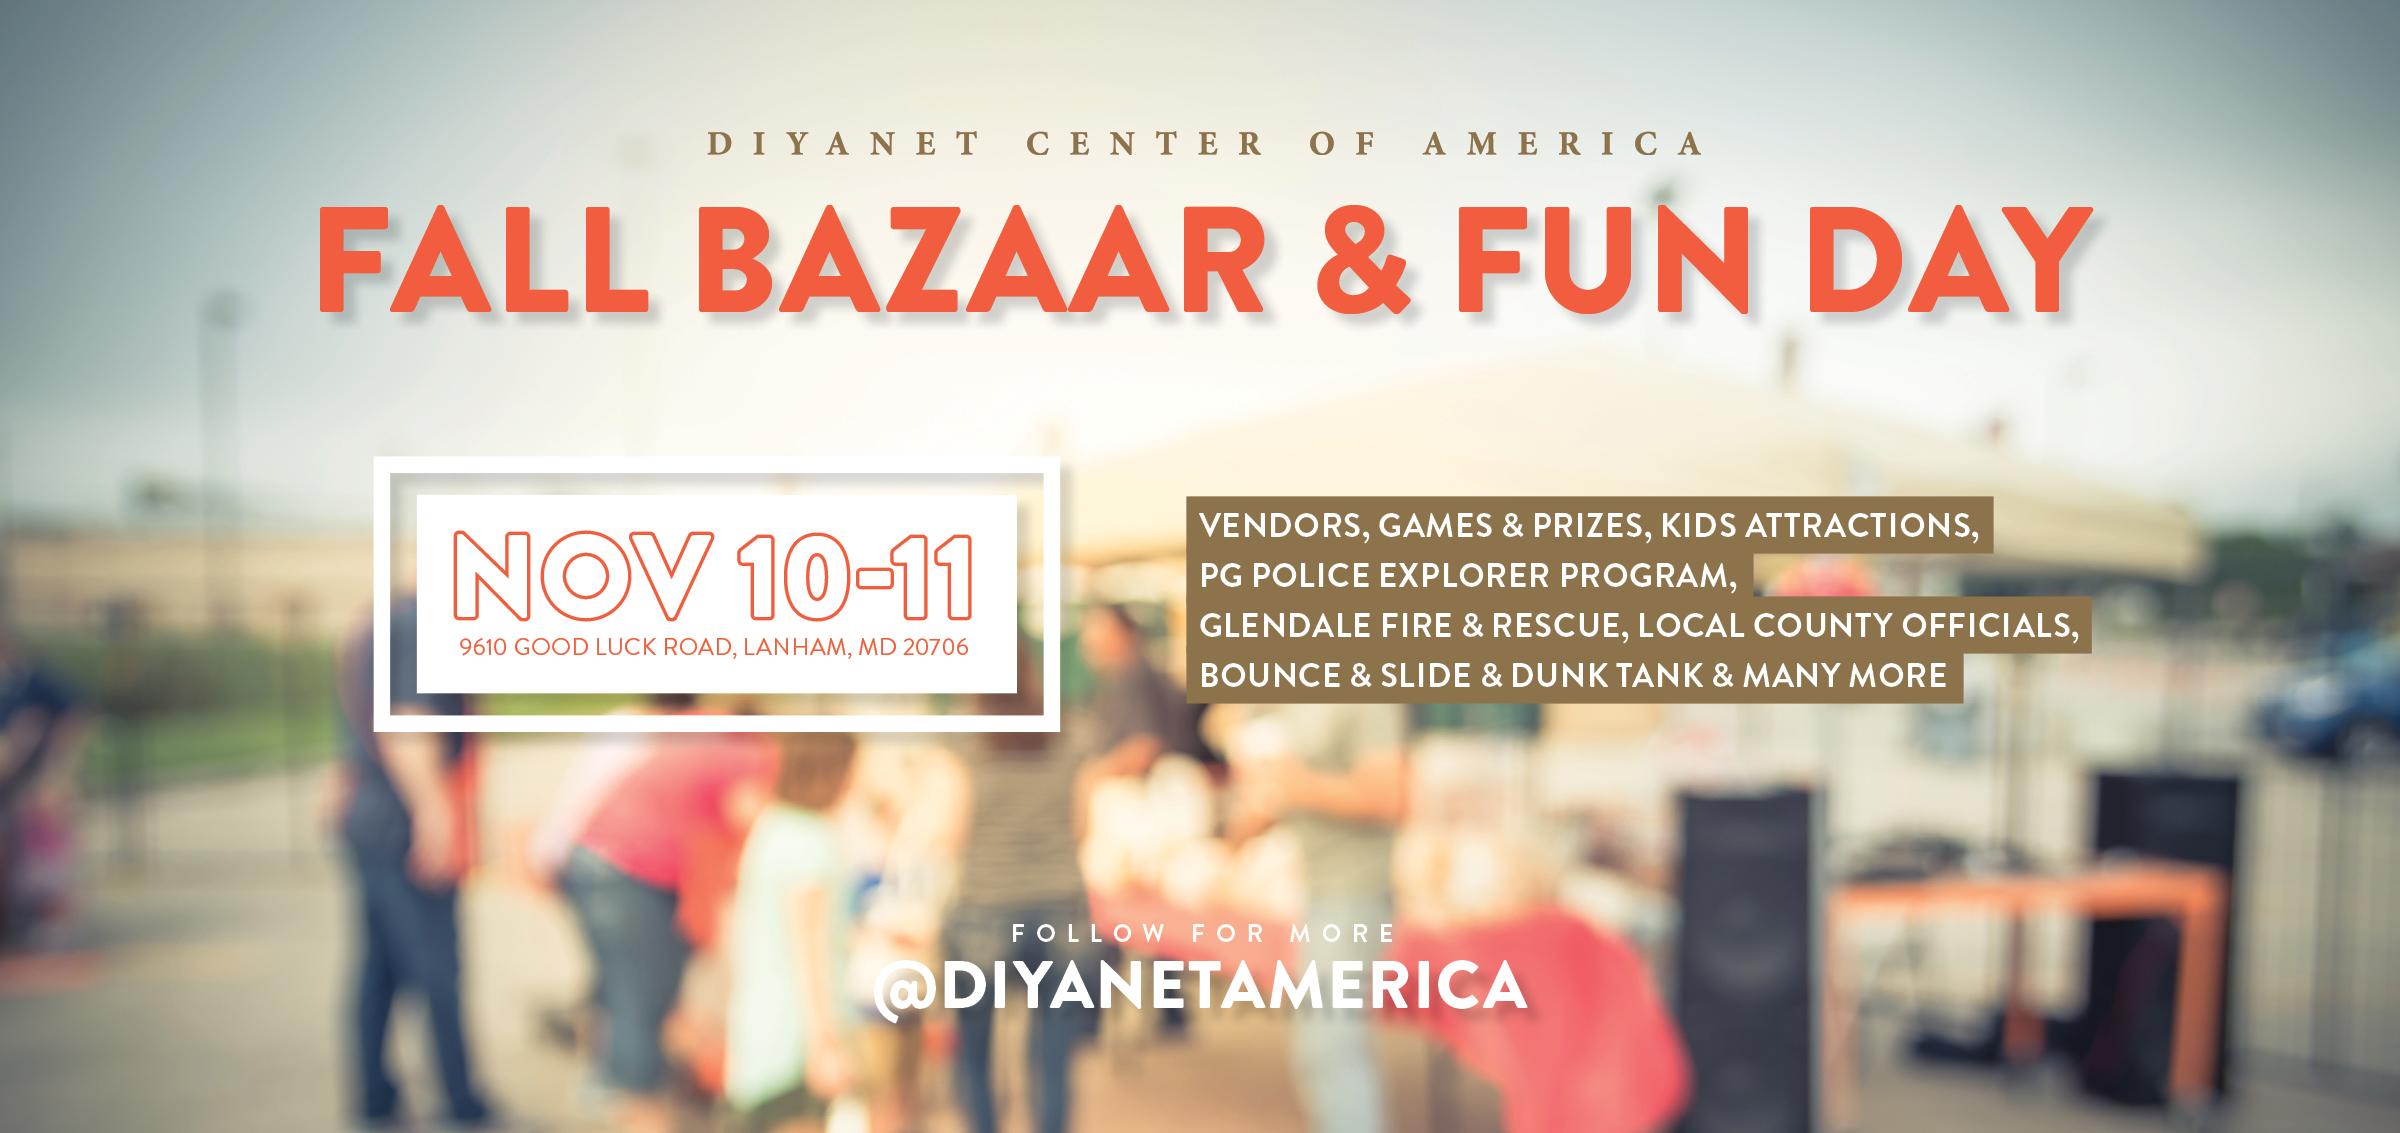 Fall Bazaar & Fun Day